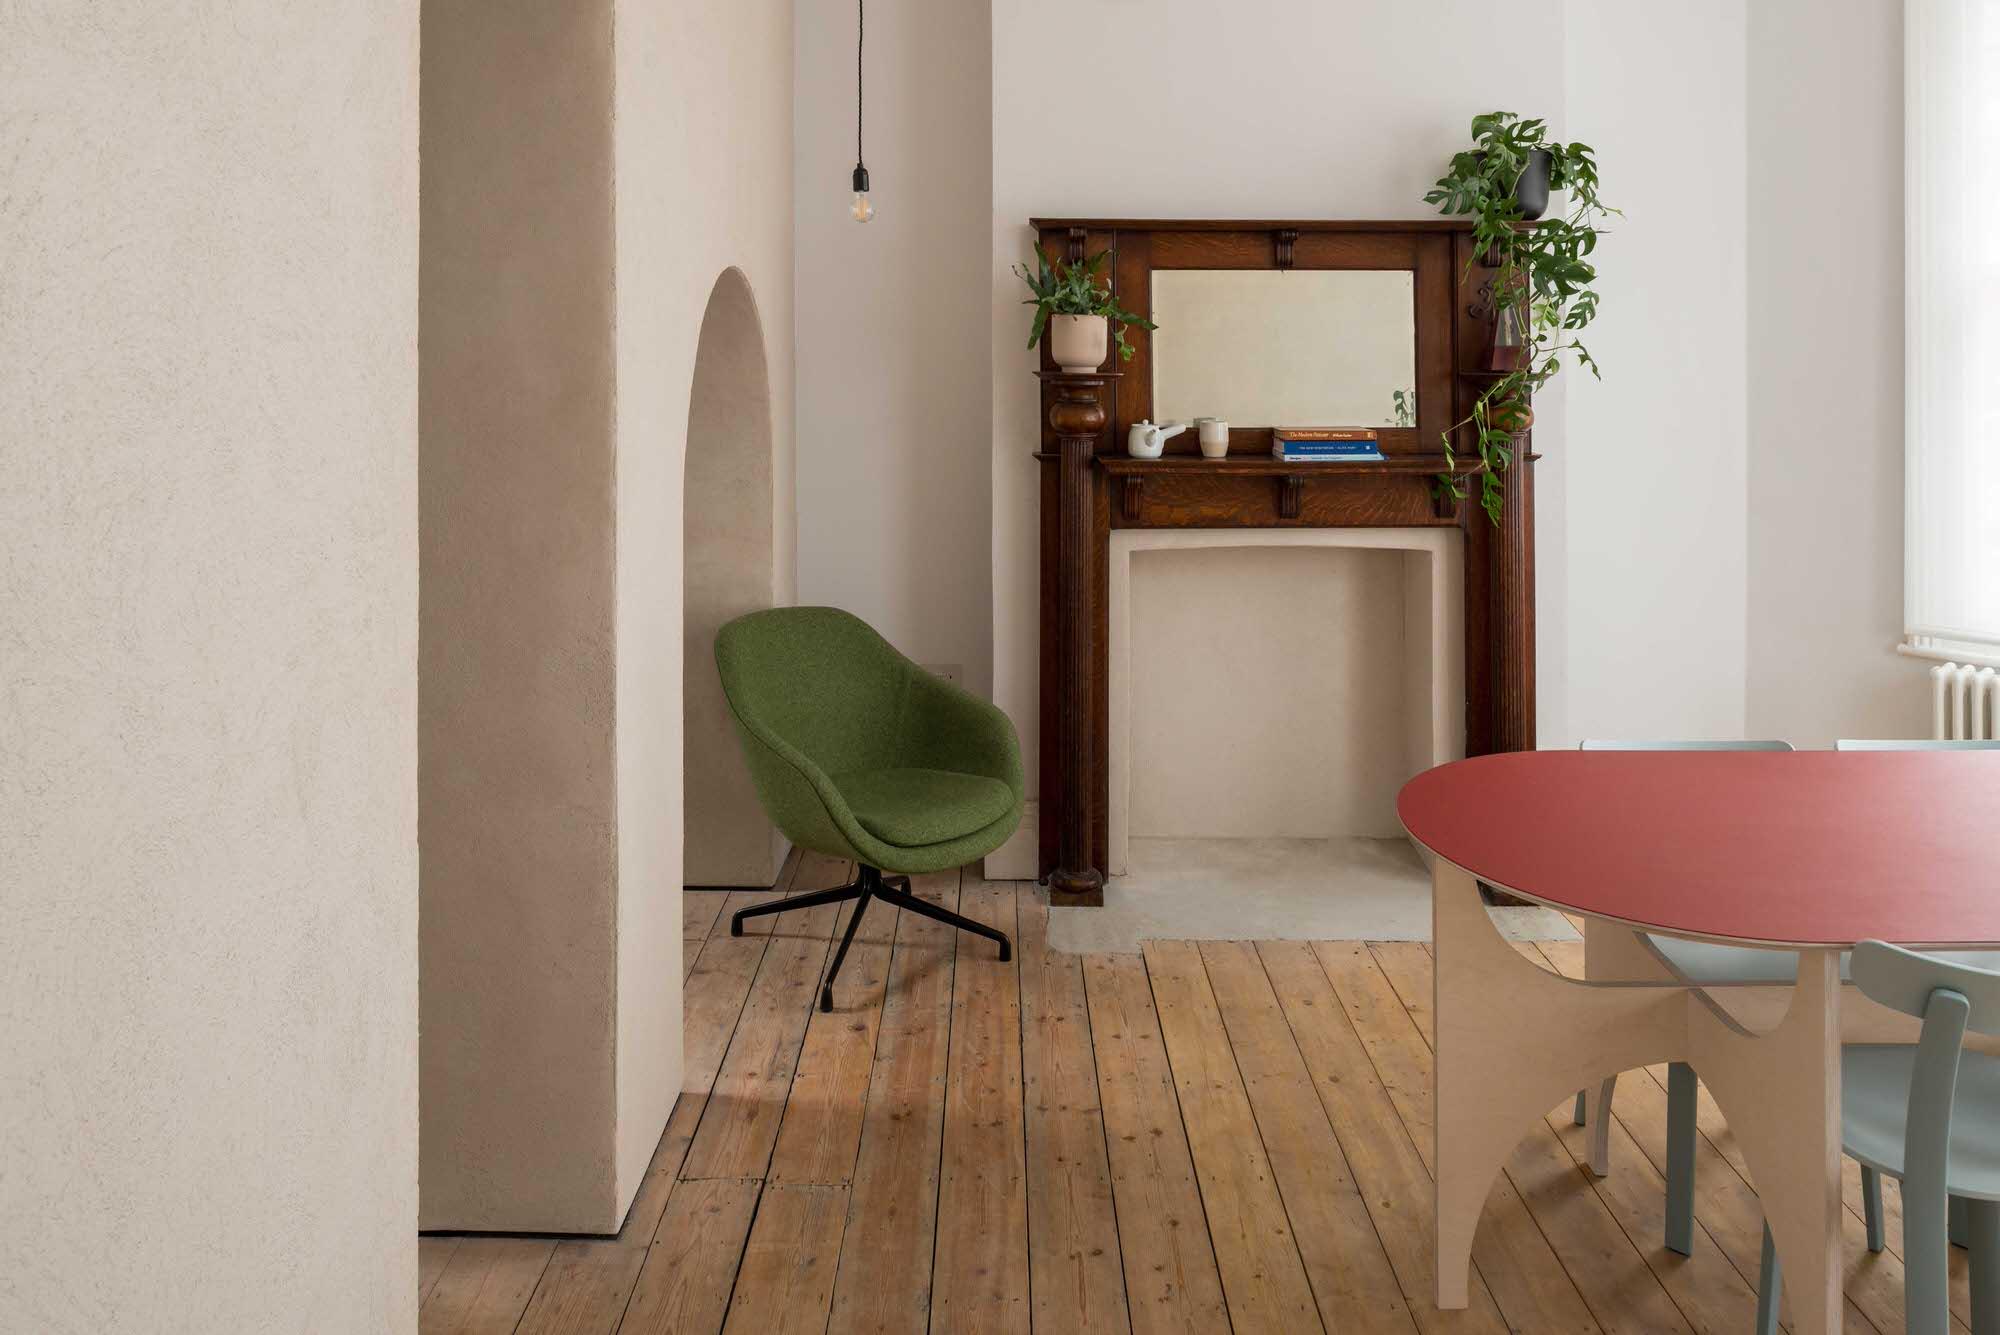 Studio Ben Allen House Recast London Residential Architecture Photo French+tye Yellowtrace 17